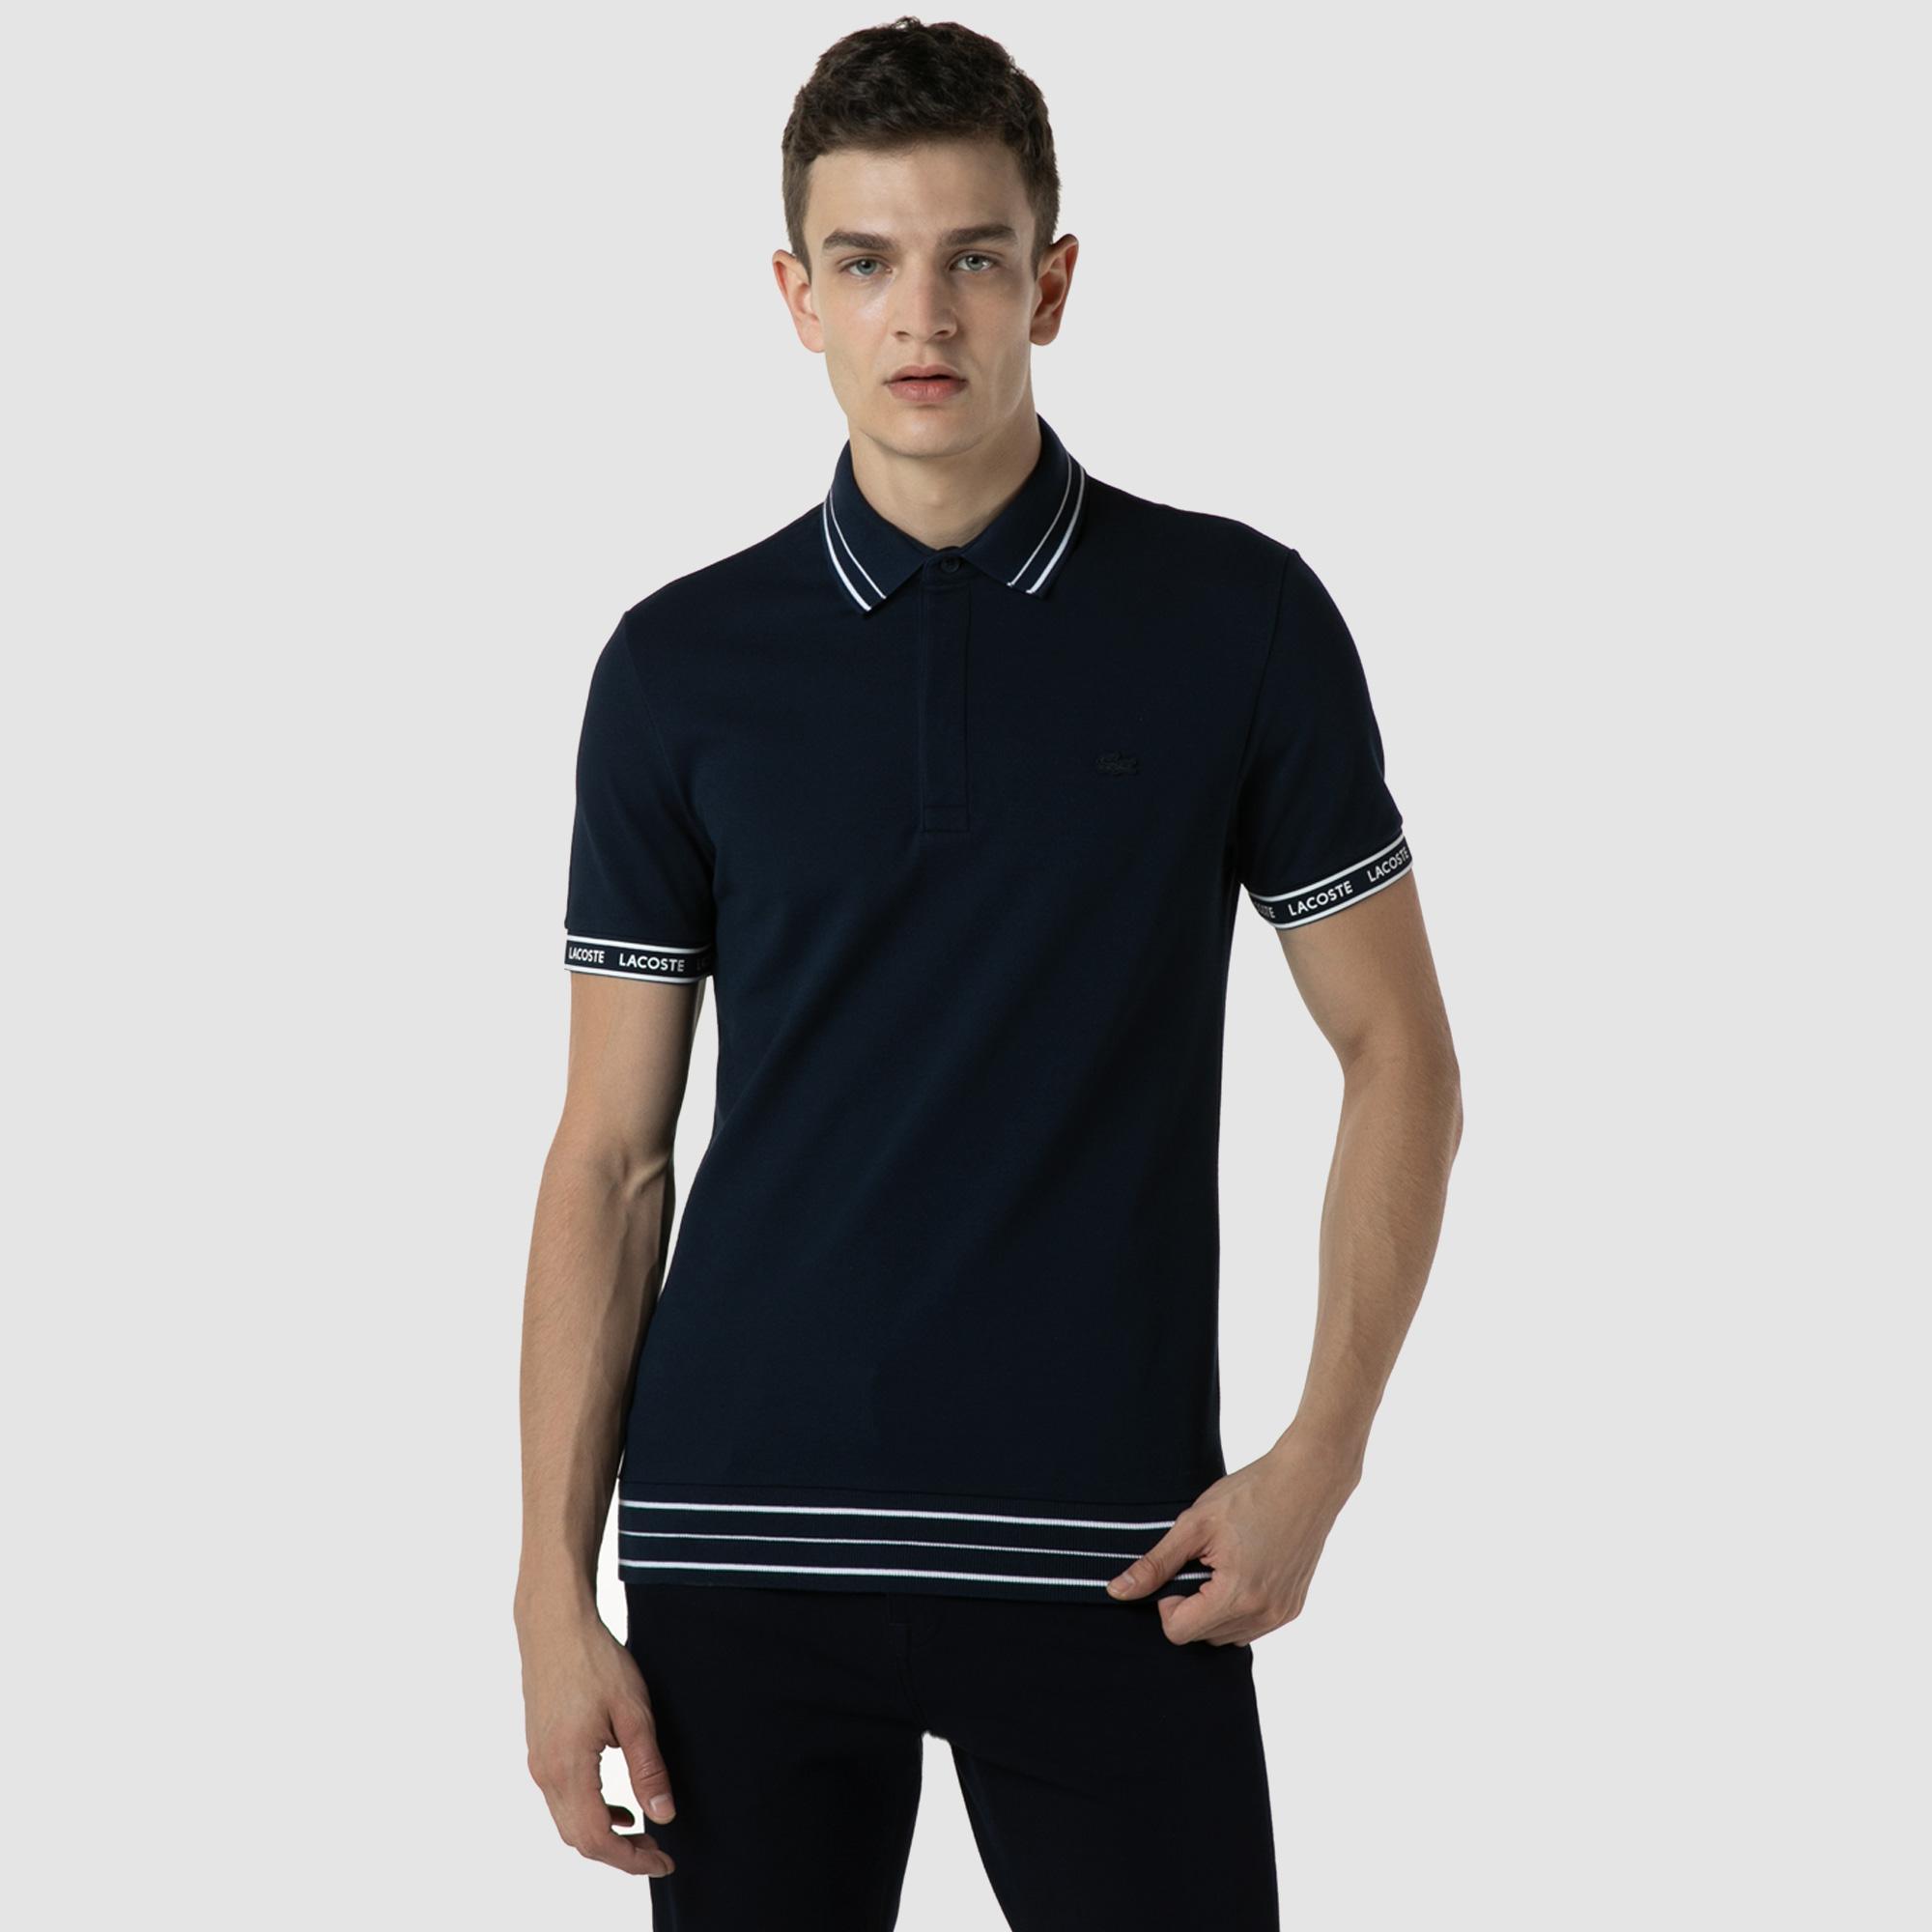 Lacoste Koszulka męska polo